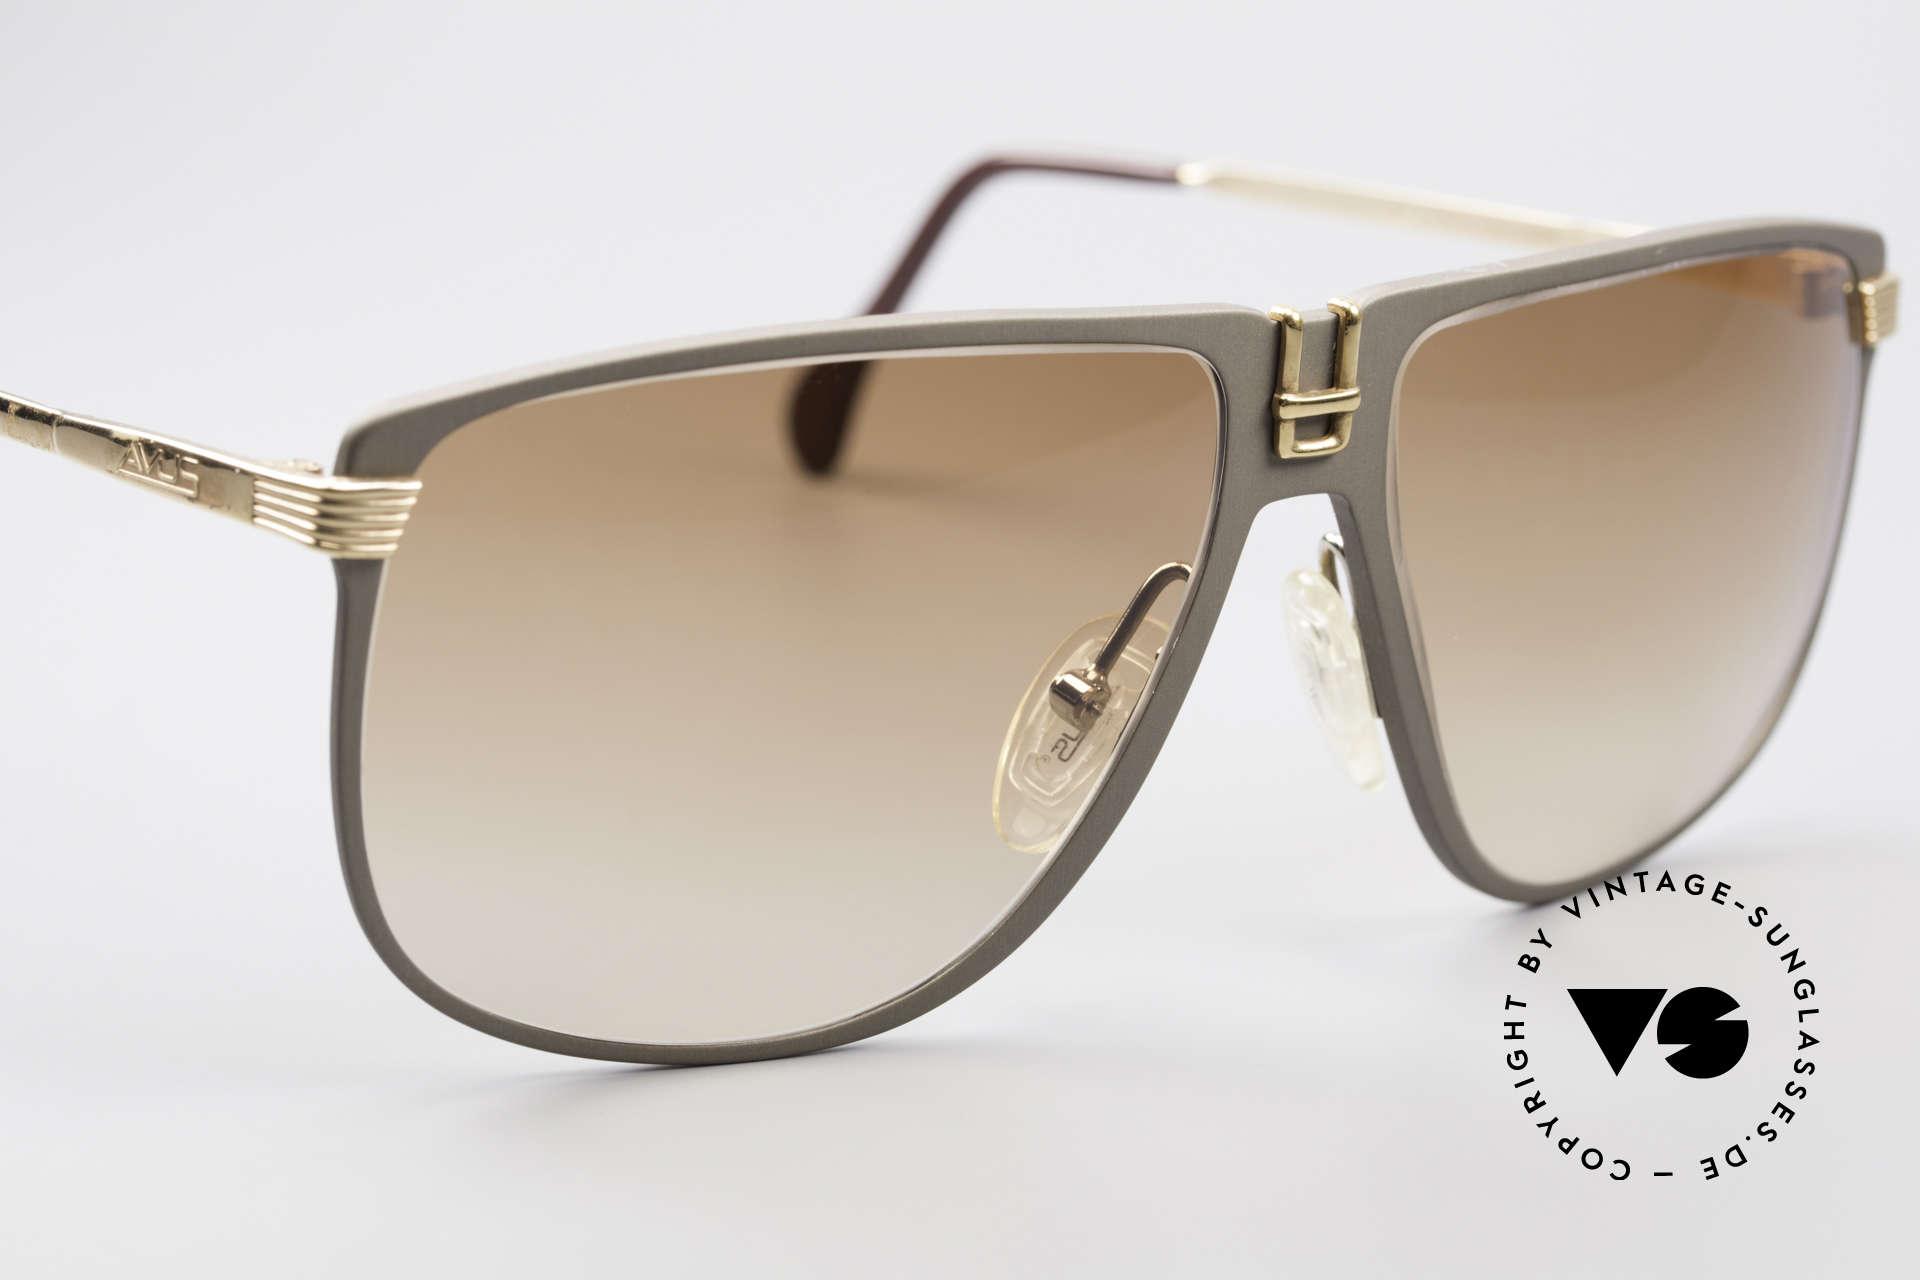 AVUS 210-30 West Germany Sunglasses, never worn (like all our RARE 1980's AVUS sunglasses), Made for Men